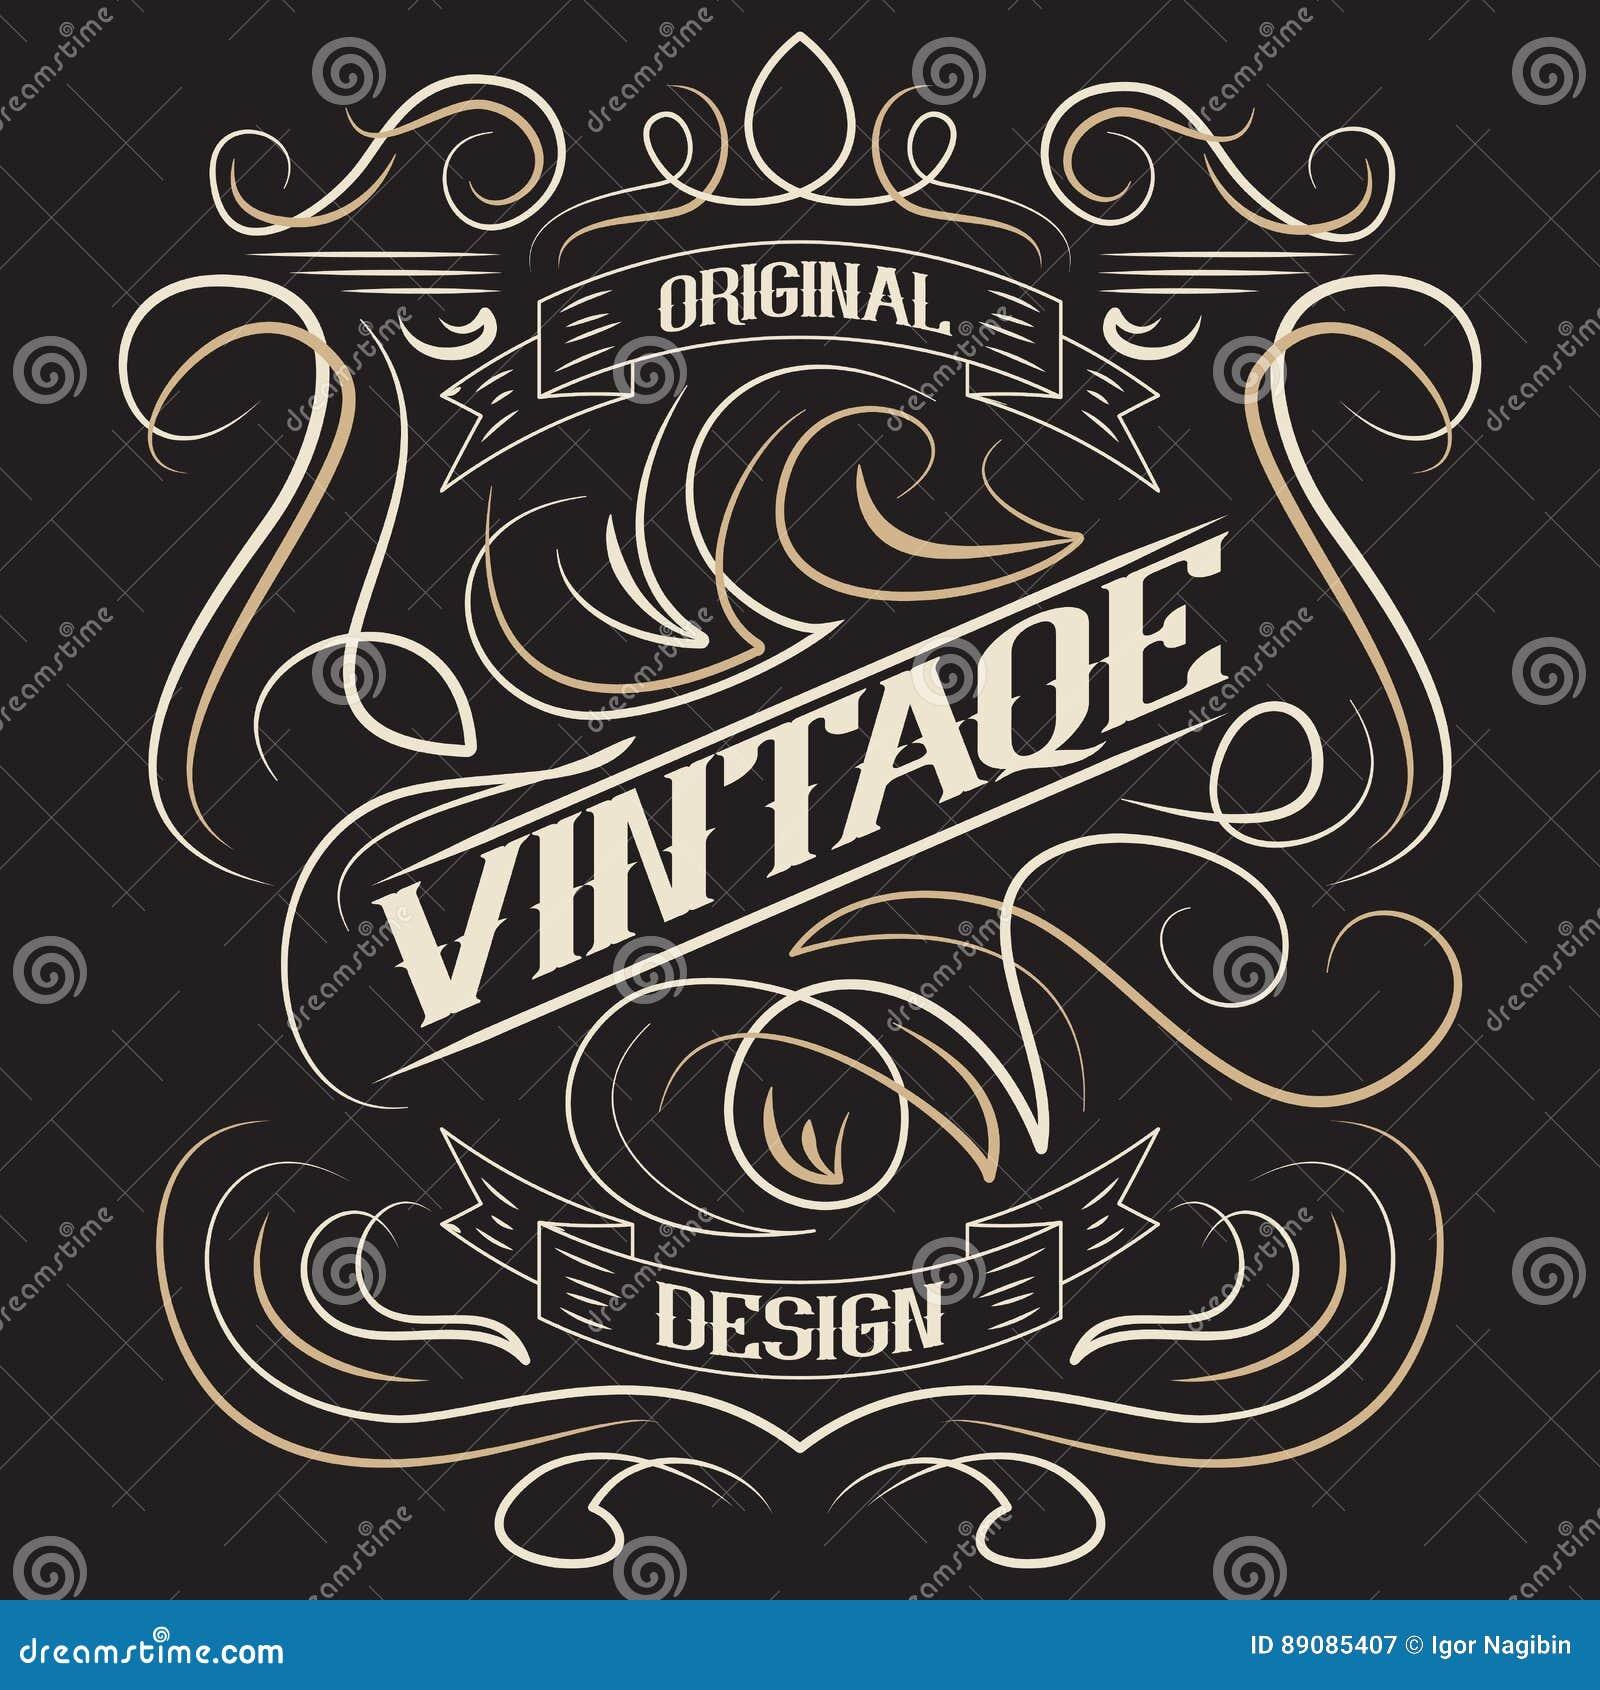 8700 Ide Desain Vintage HD Terbaik Unduh Gratis